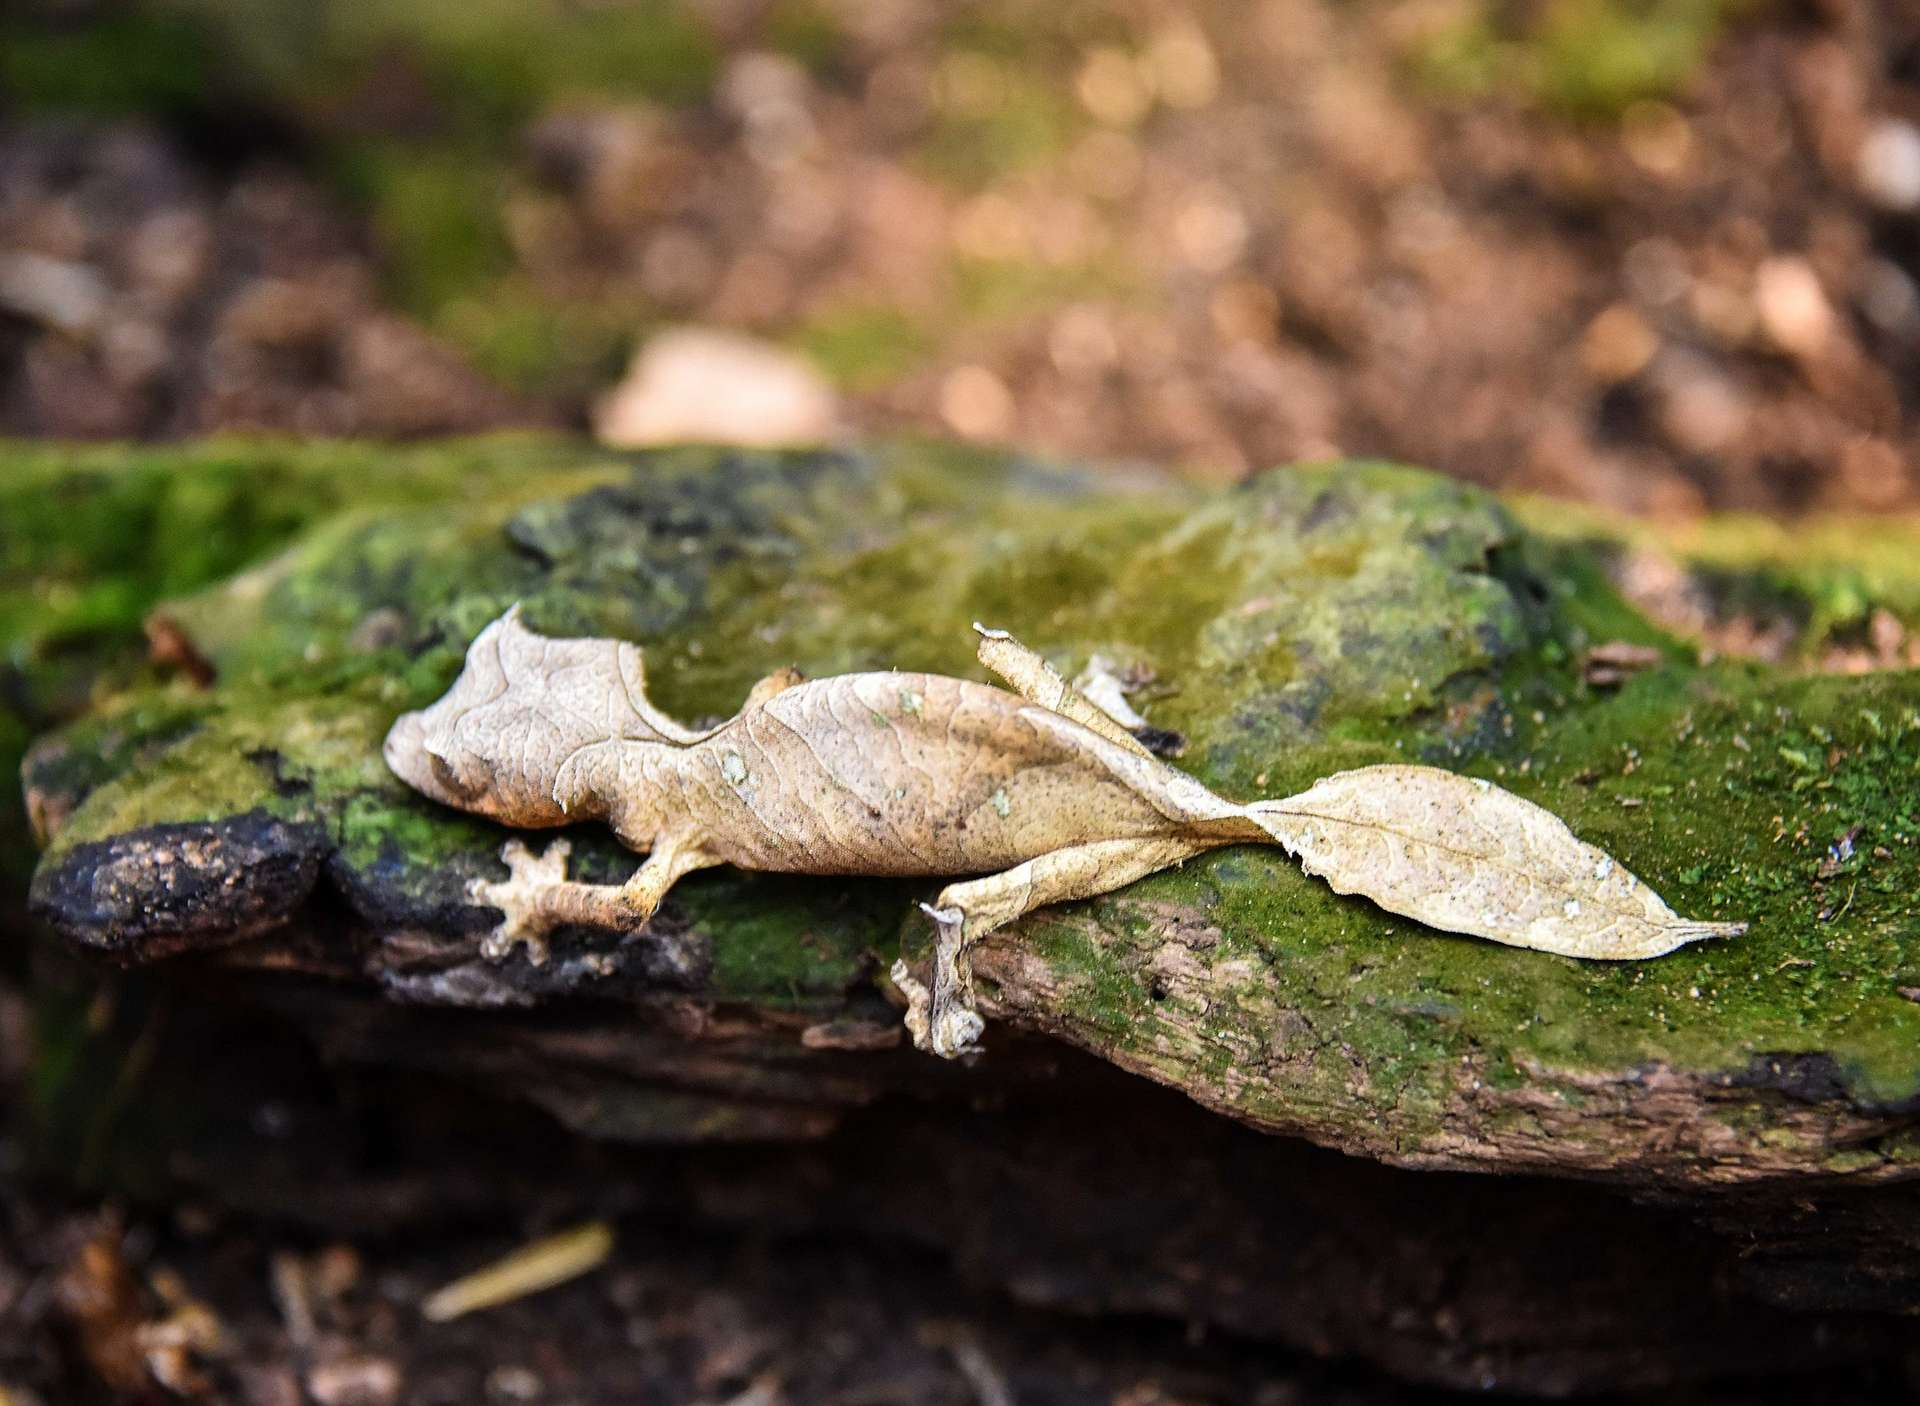 Un Uroplatus phantasticus dans la forêt humide de Madagascar. © Rod Waddington, CC by-sa 2.0